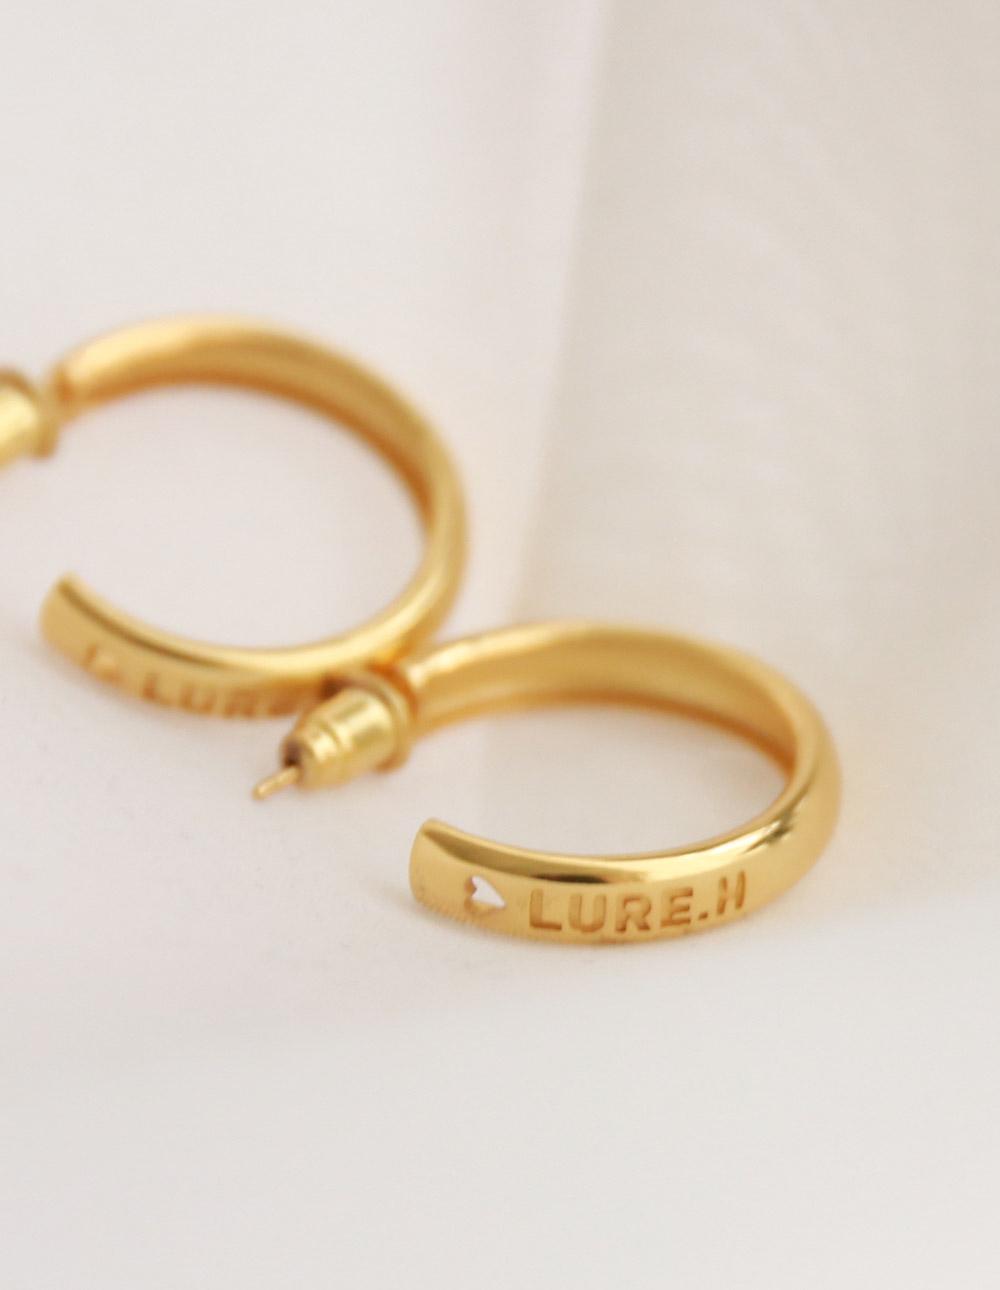 LURE H 925純銀耳環